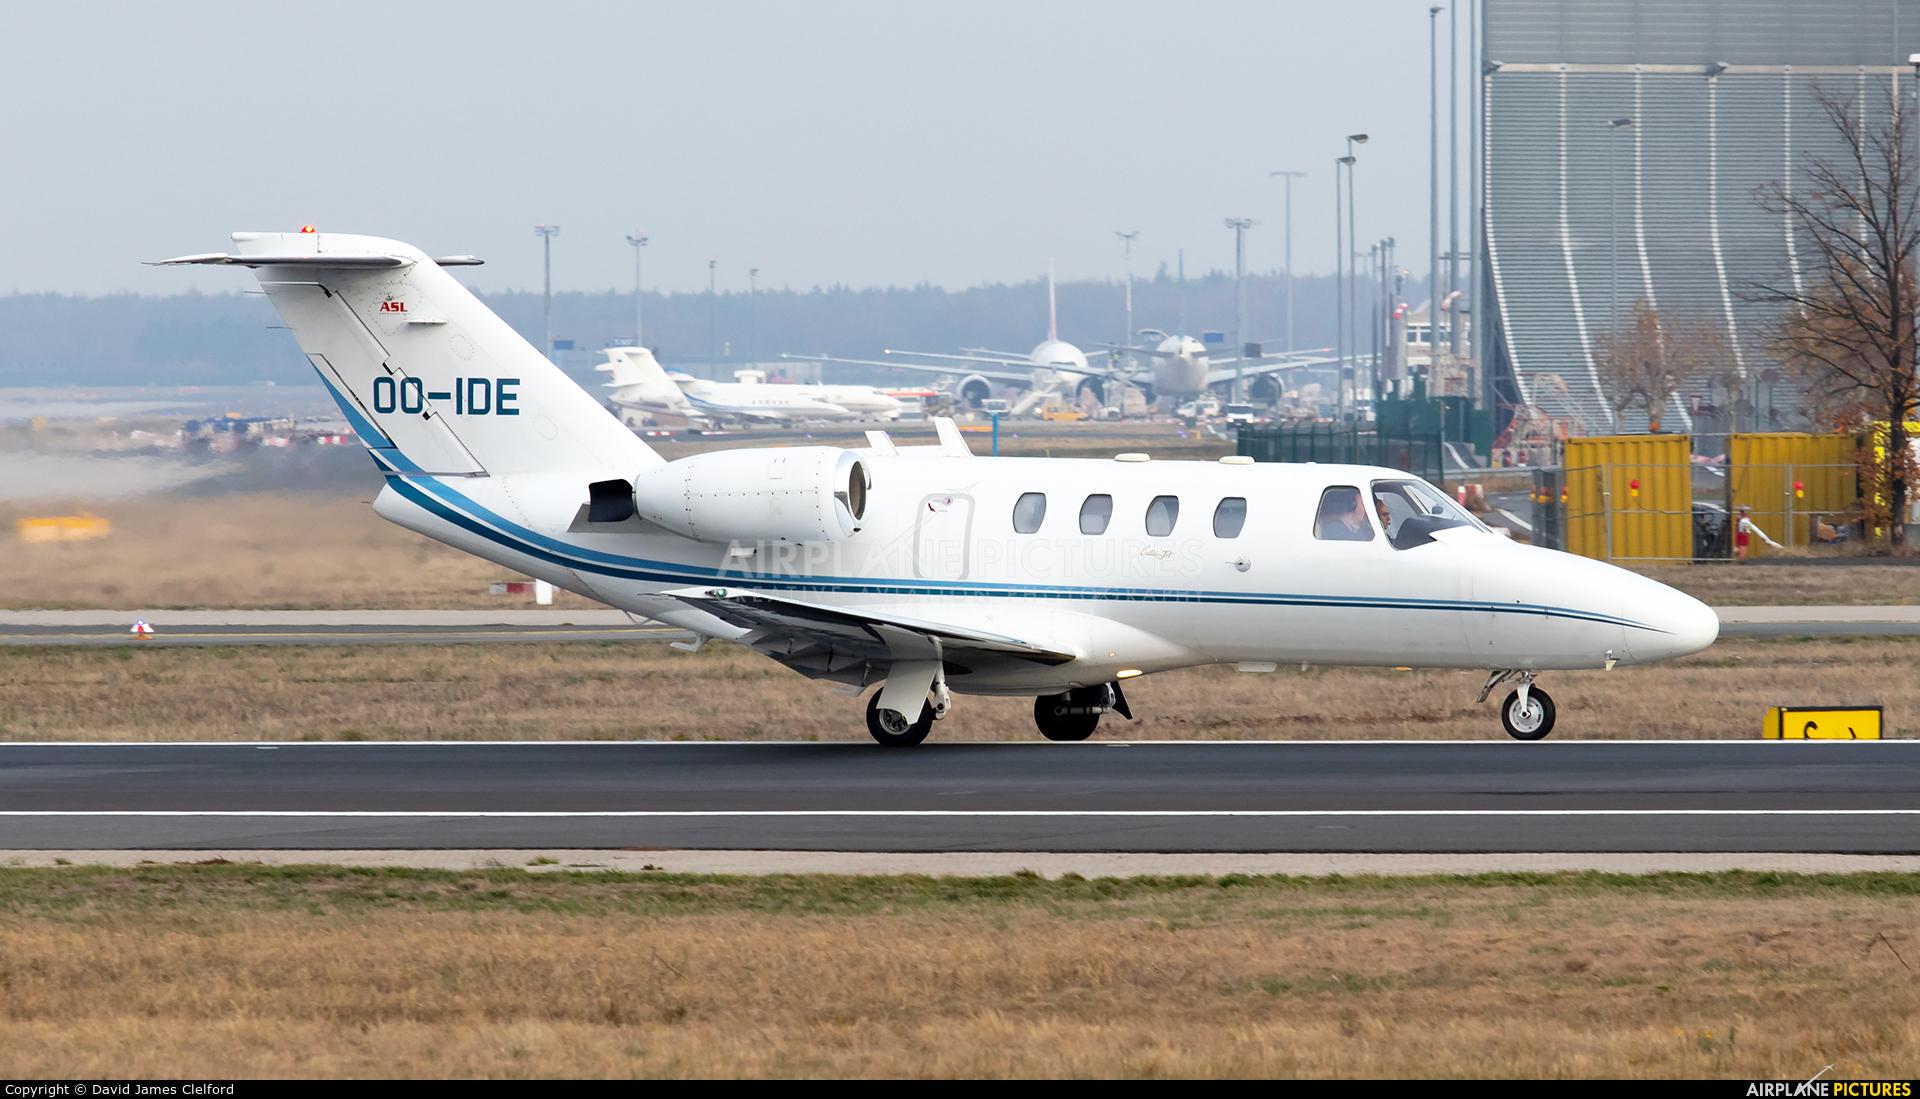 ASL - Air Service Liege OO-IDE aircraft at Frankfurt